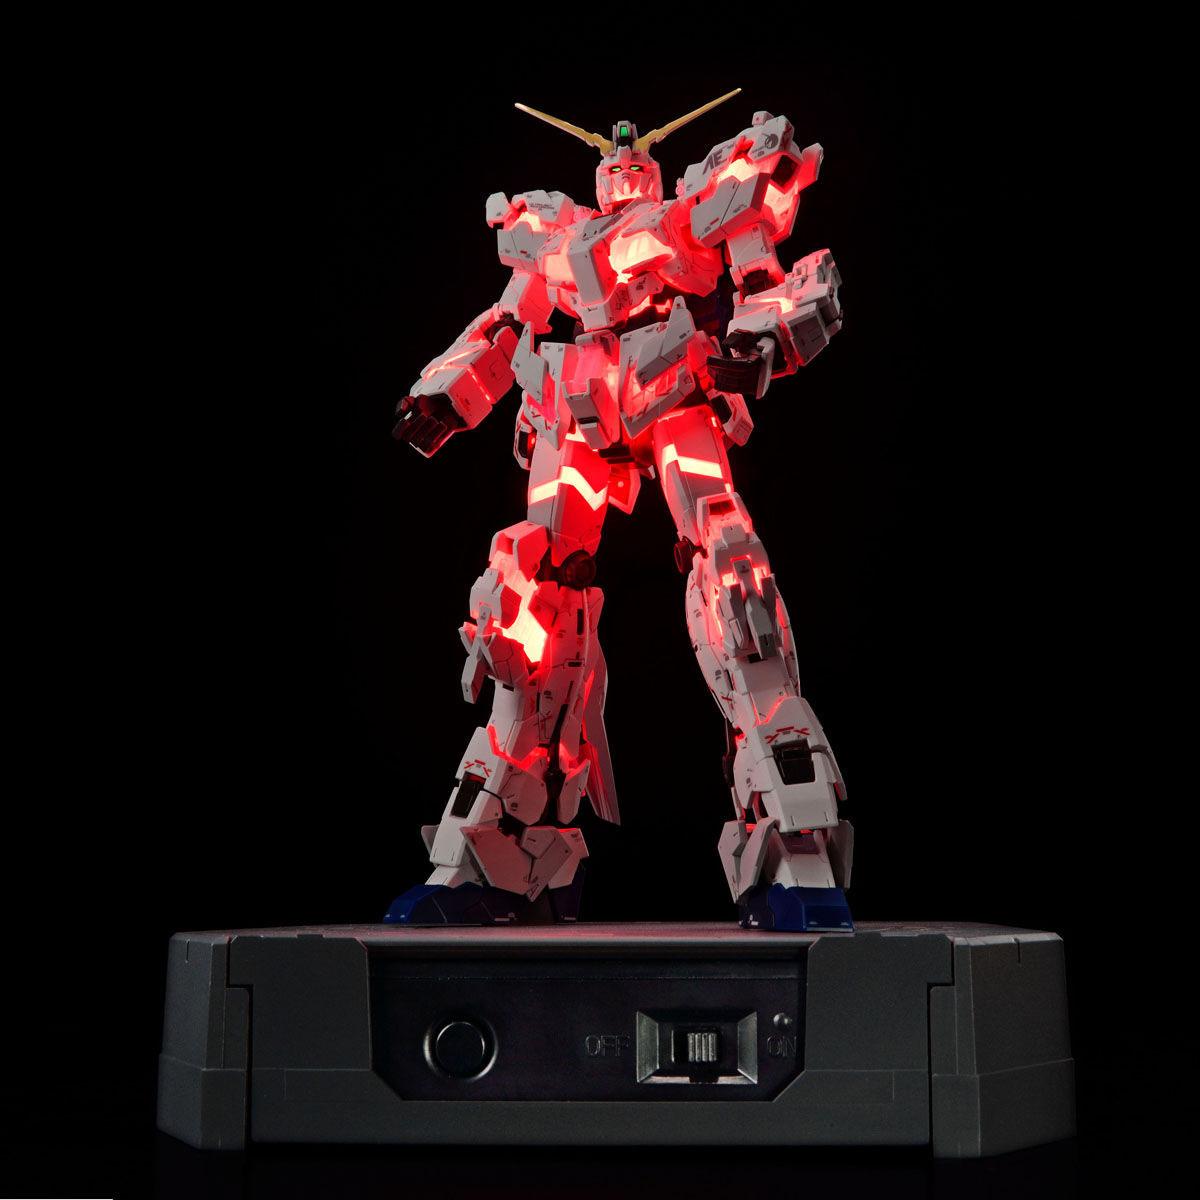 RG 1/144『ガンダムベース限定 RX-0 ユニコーンガンダム(デストロイモード)Ver.TWC(LIGHTING MODEL)』プラモデル-005